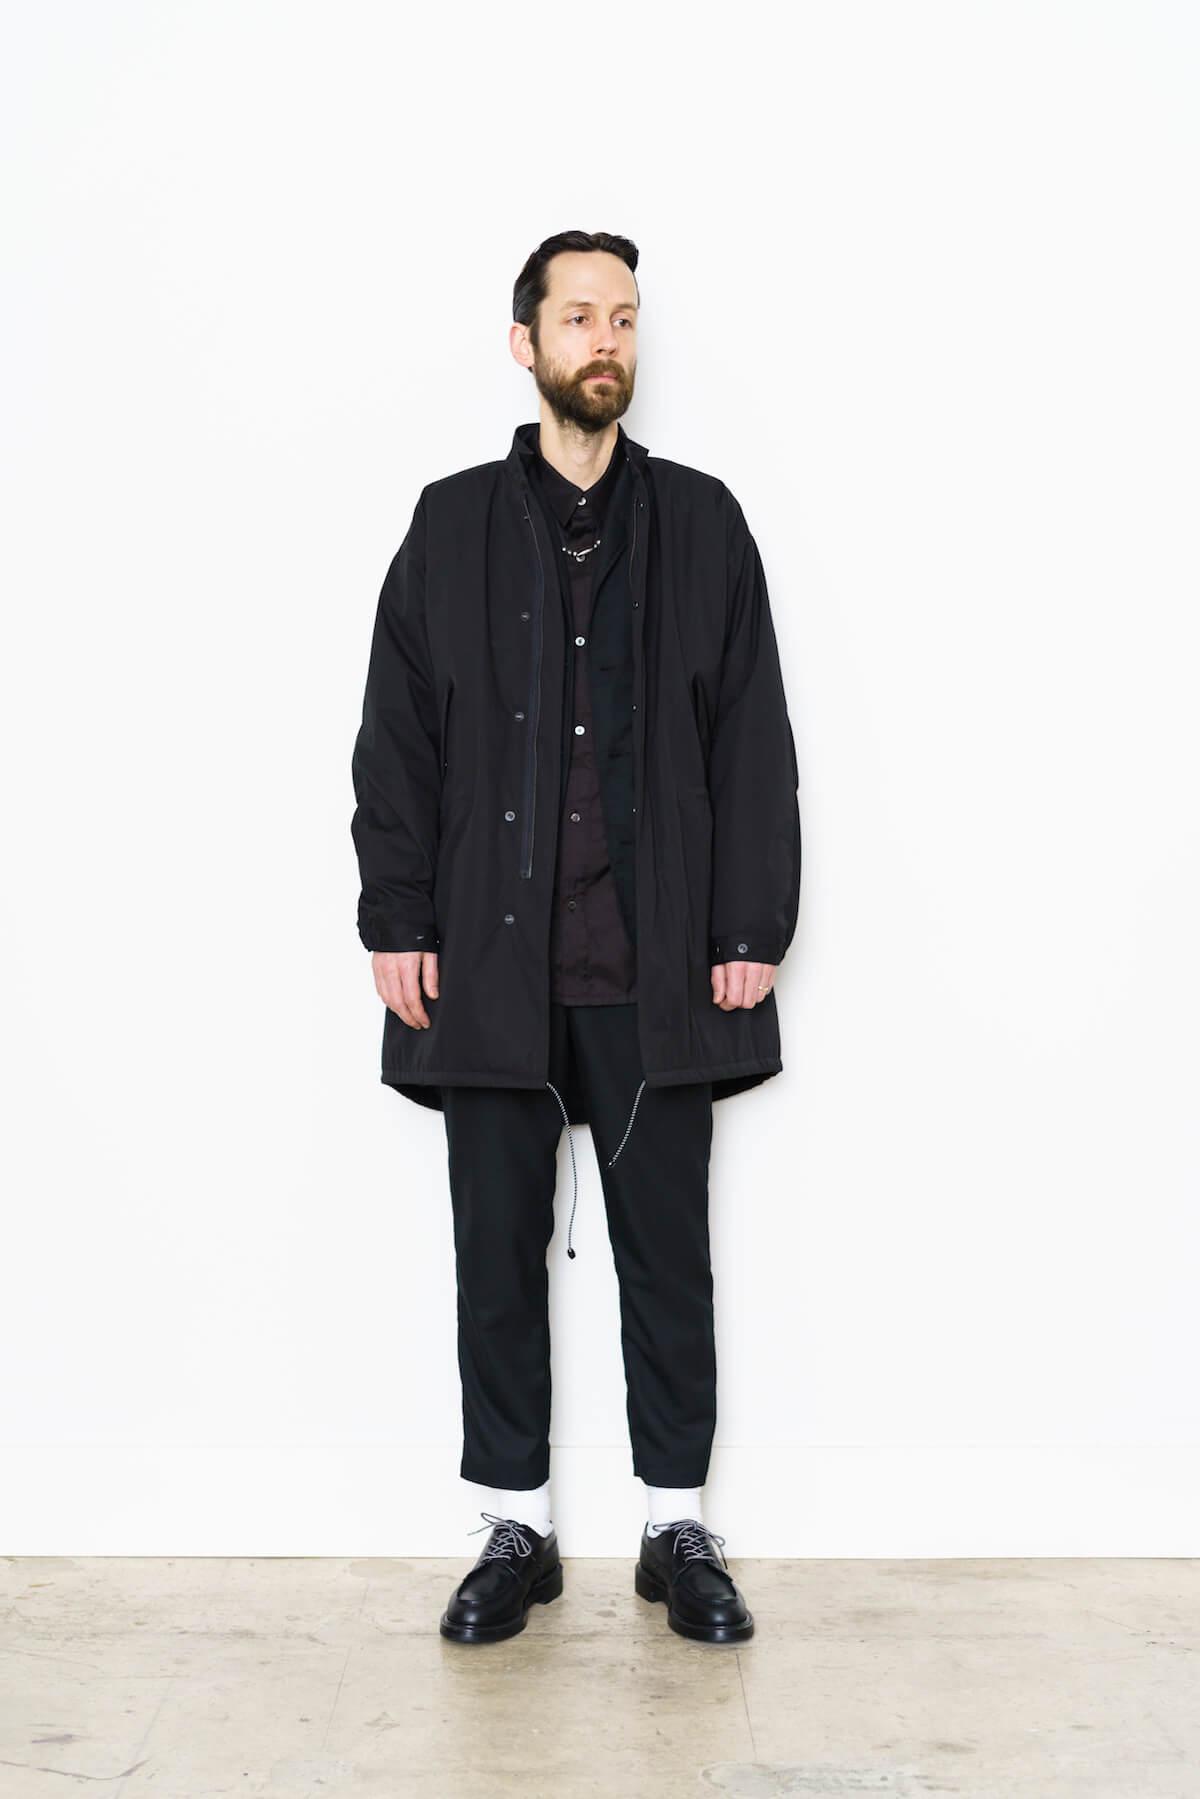 Black(黒/影)×Blank(白/空白)。ブランド「BLANCK」2018AWルックが公開! fashion_blanck_12